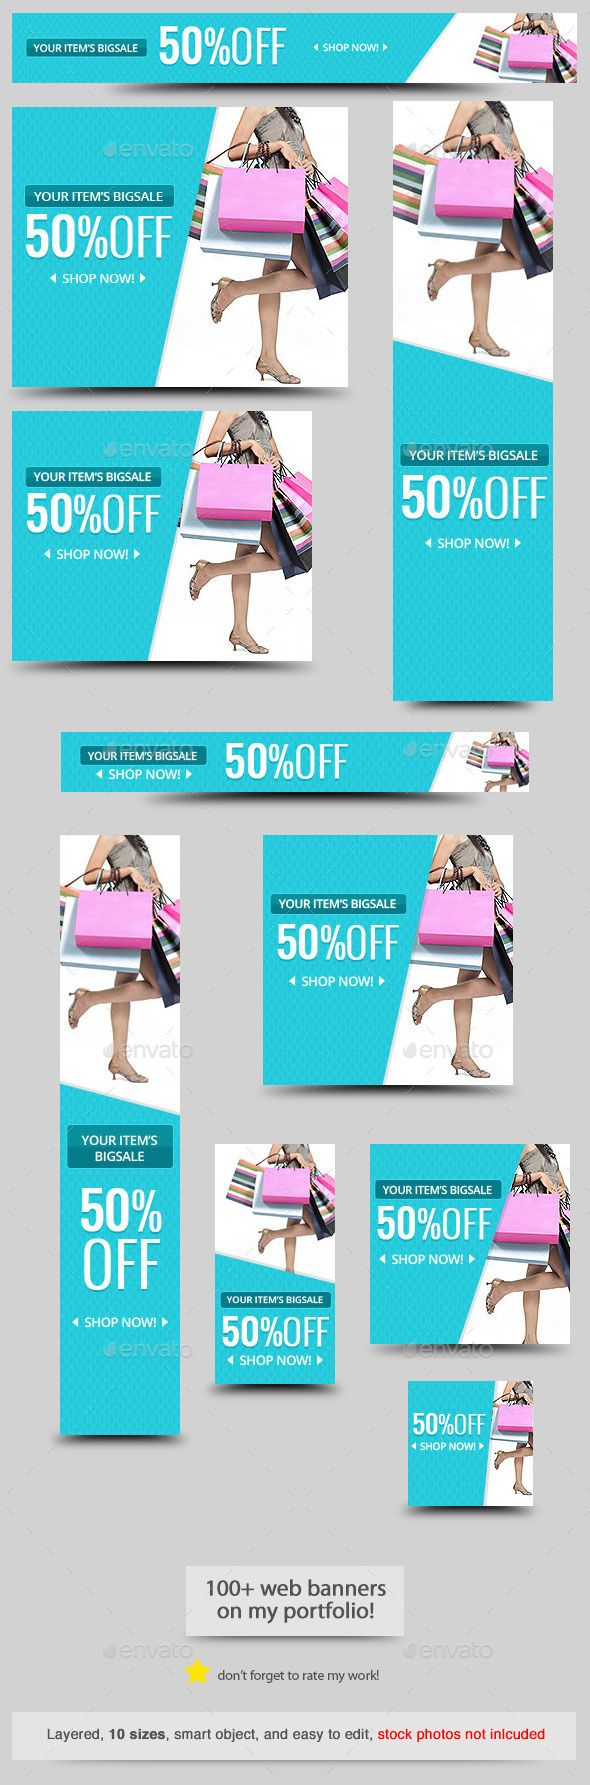 Cool Big Sale Web Banner Template #design #web #ads Download: http://graphicriver.net/item/cool-big-sale-web-banner-template/12670331?ref=ksioks